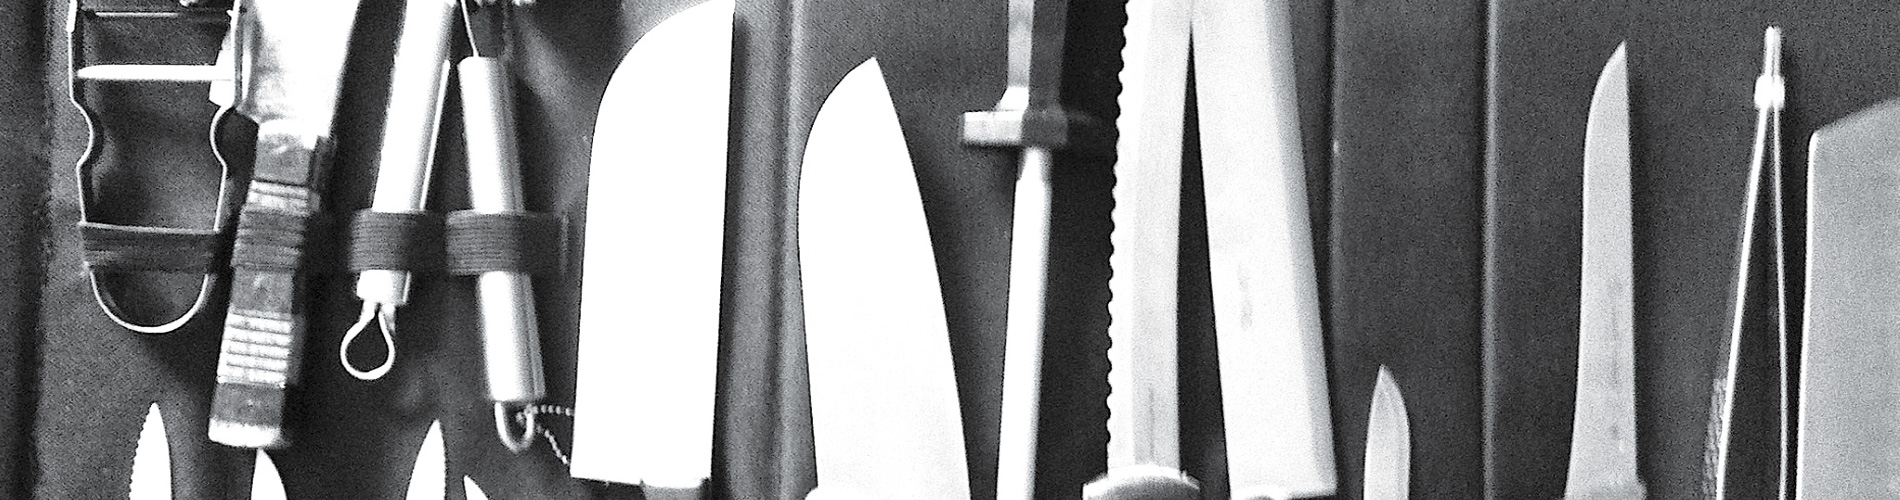 coltelli carlo olivari